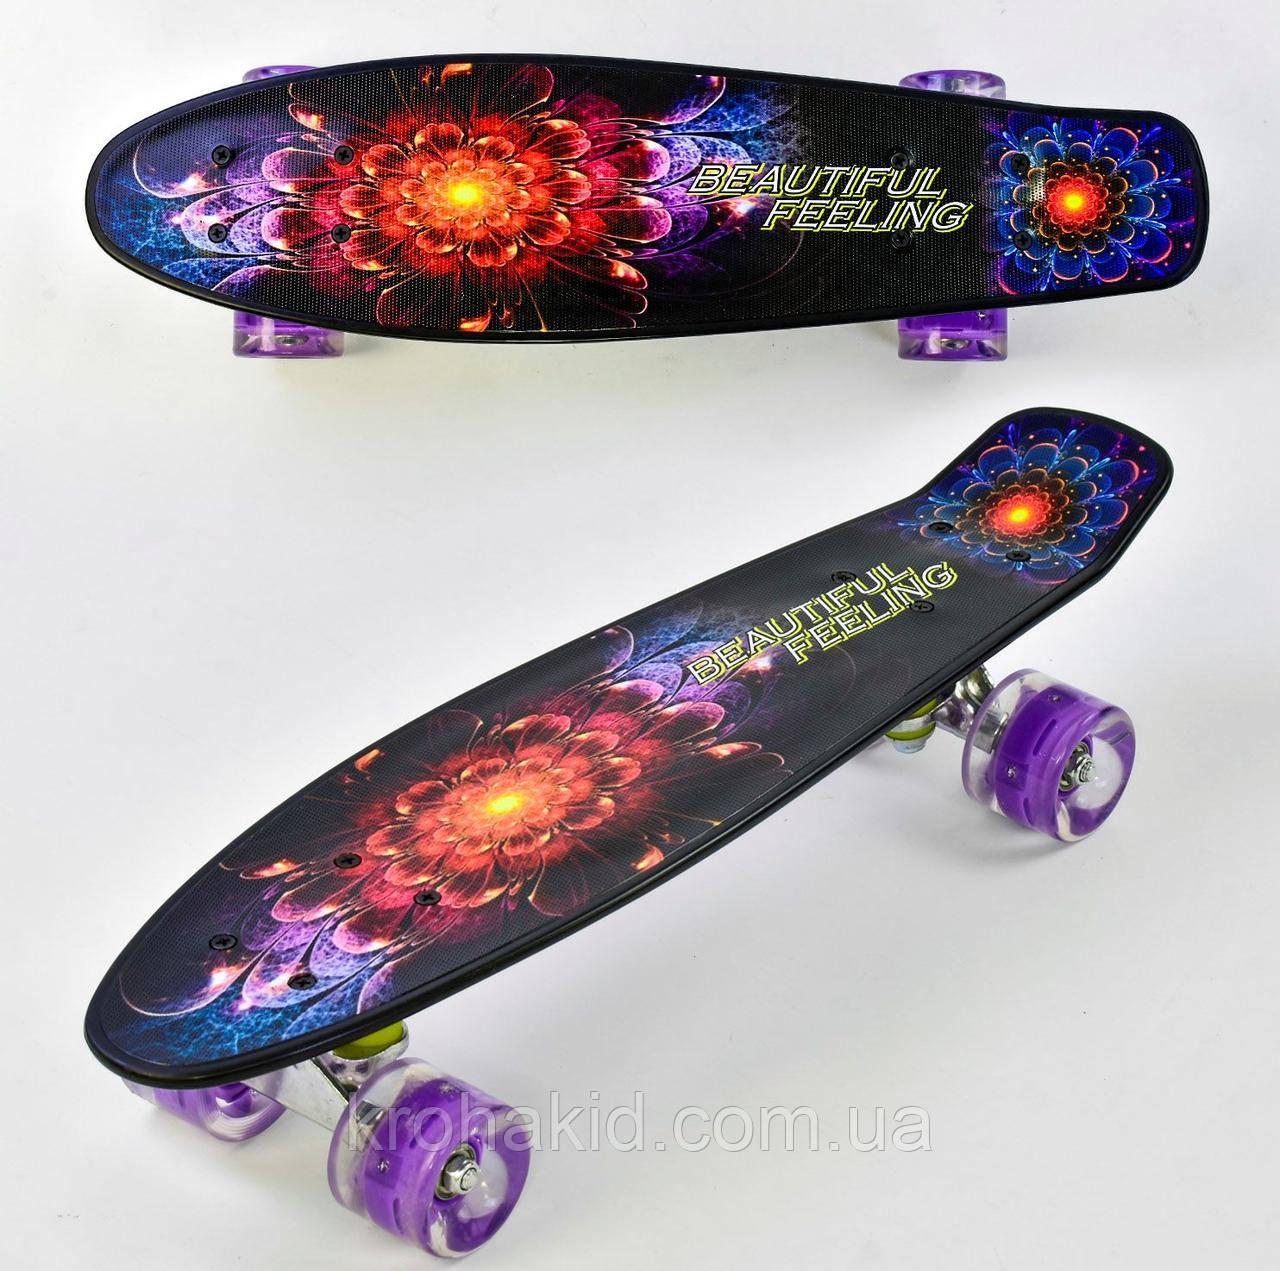 Скейт F 8740  Best Board, доска=55см, колёса PU, СВЕТЯТСЯ, d=6см